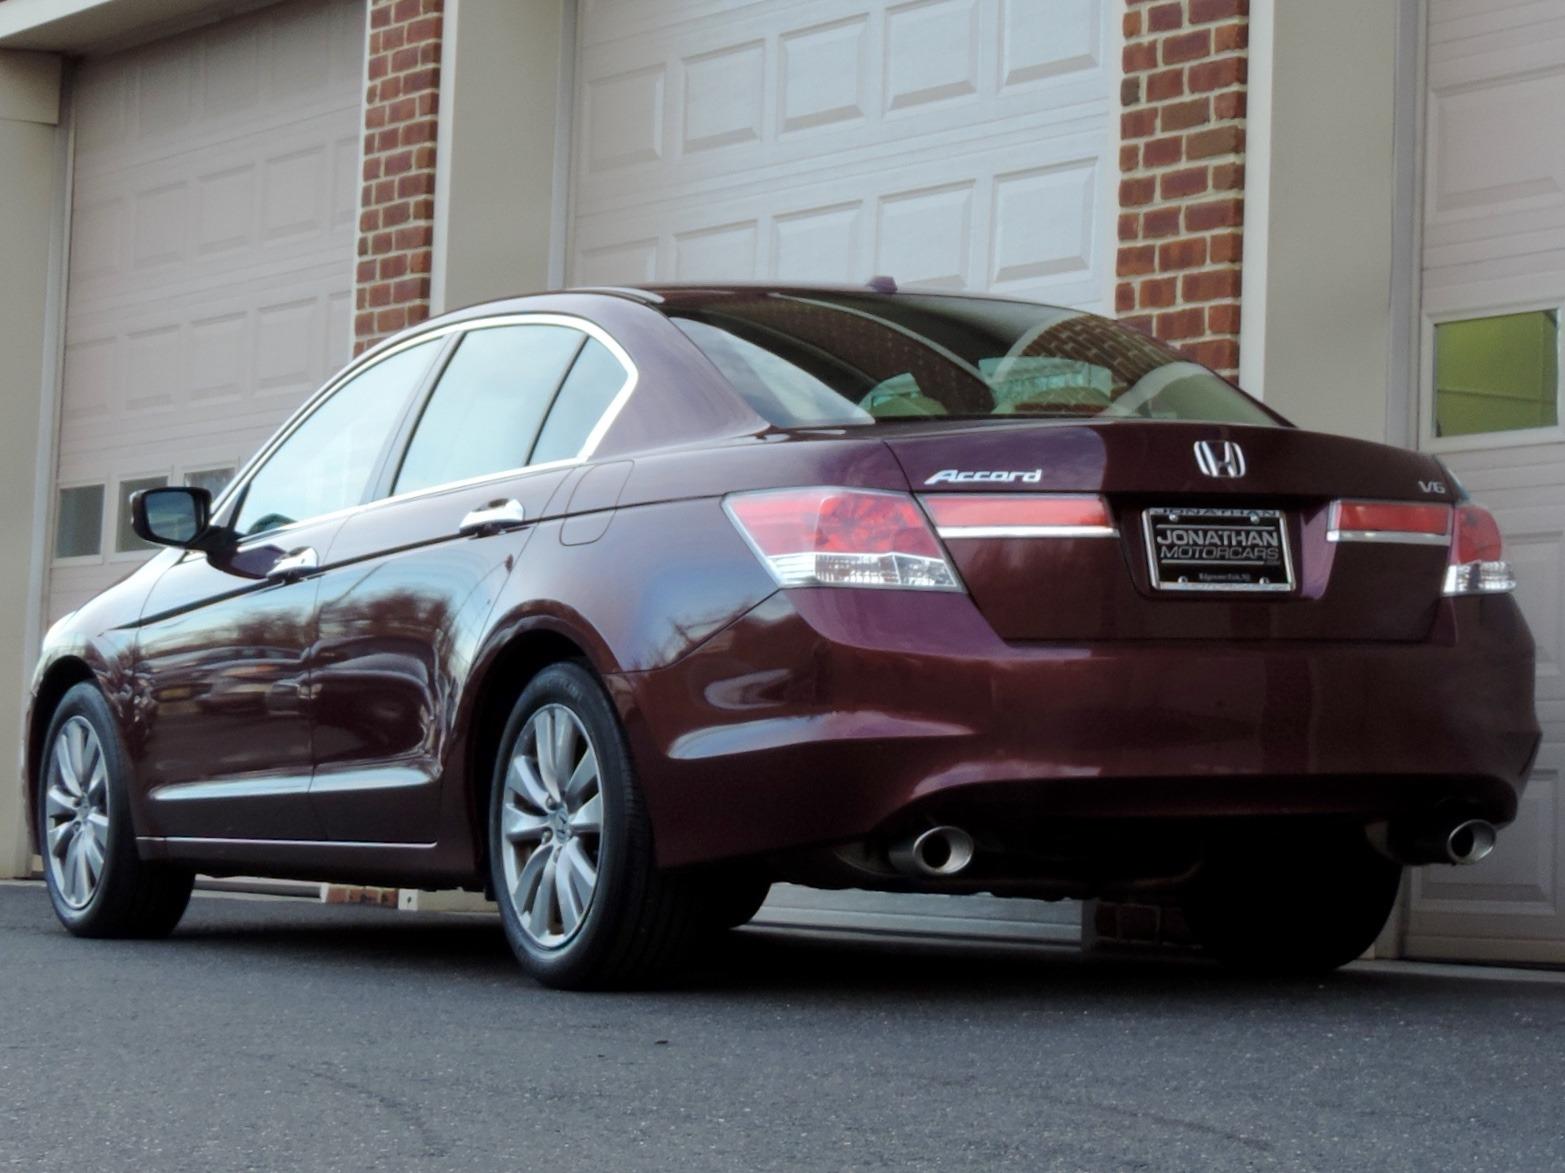 Honda Dealers Nj >> 2012 Honda Accord EX-L V6 Stock # 021444 for sale near ...